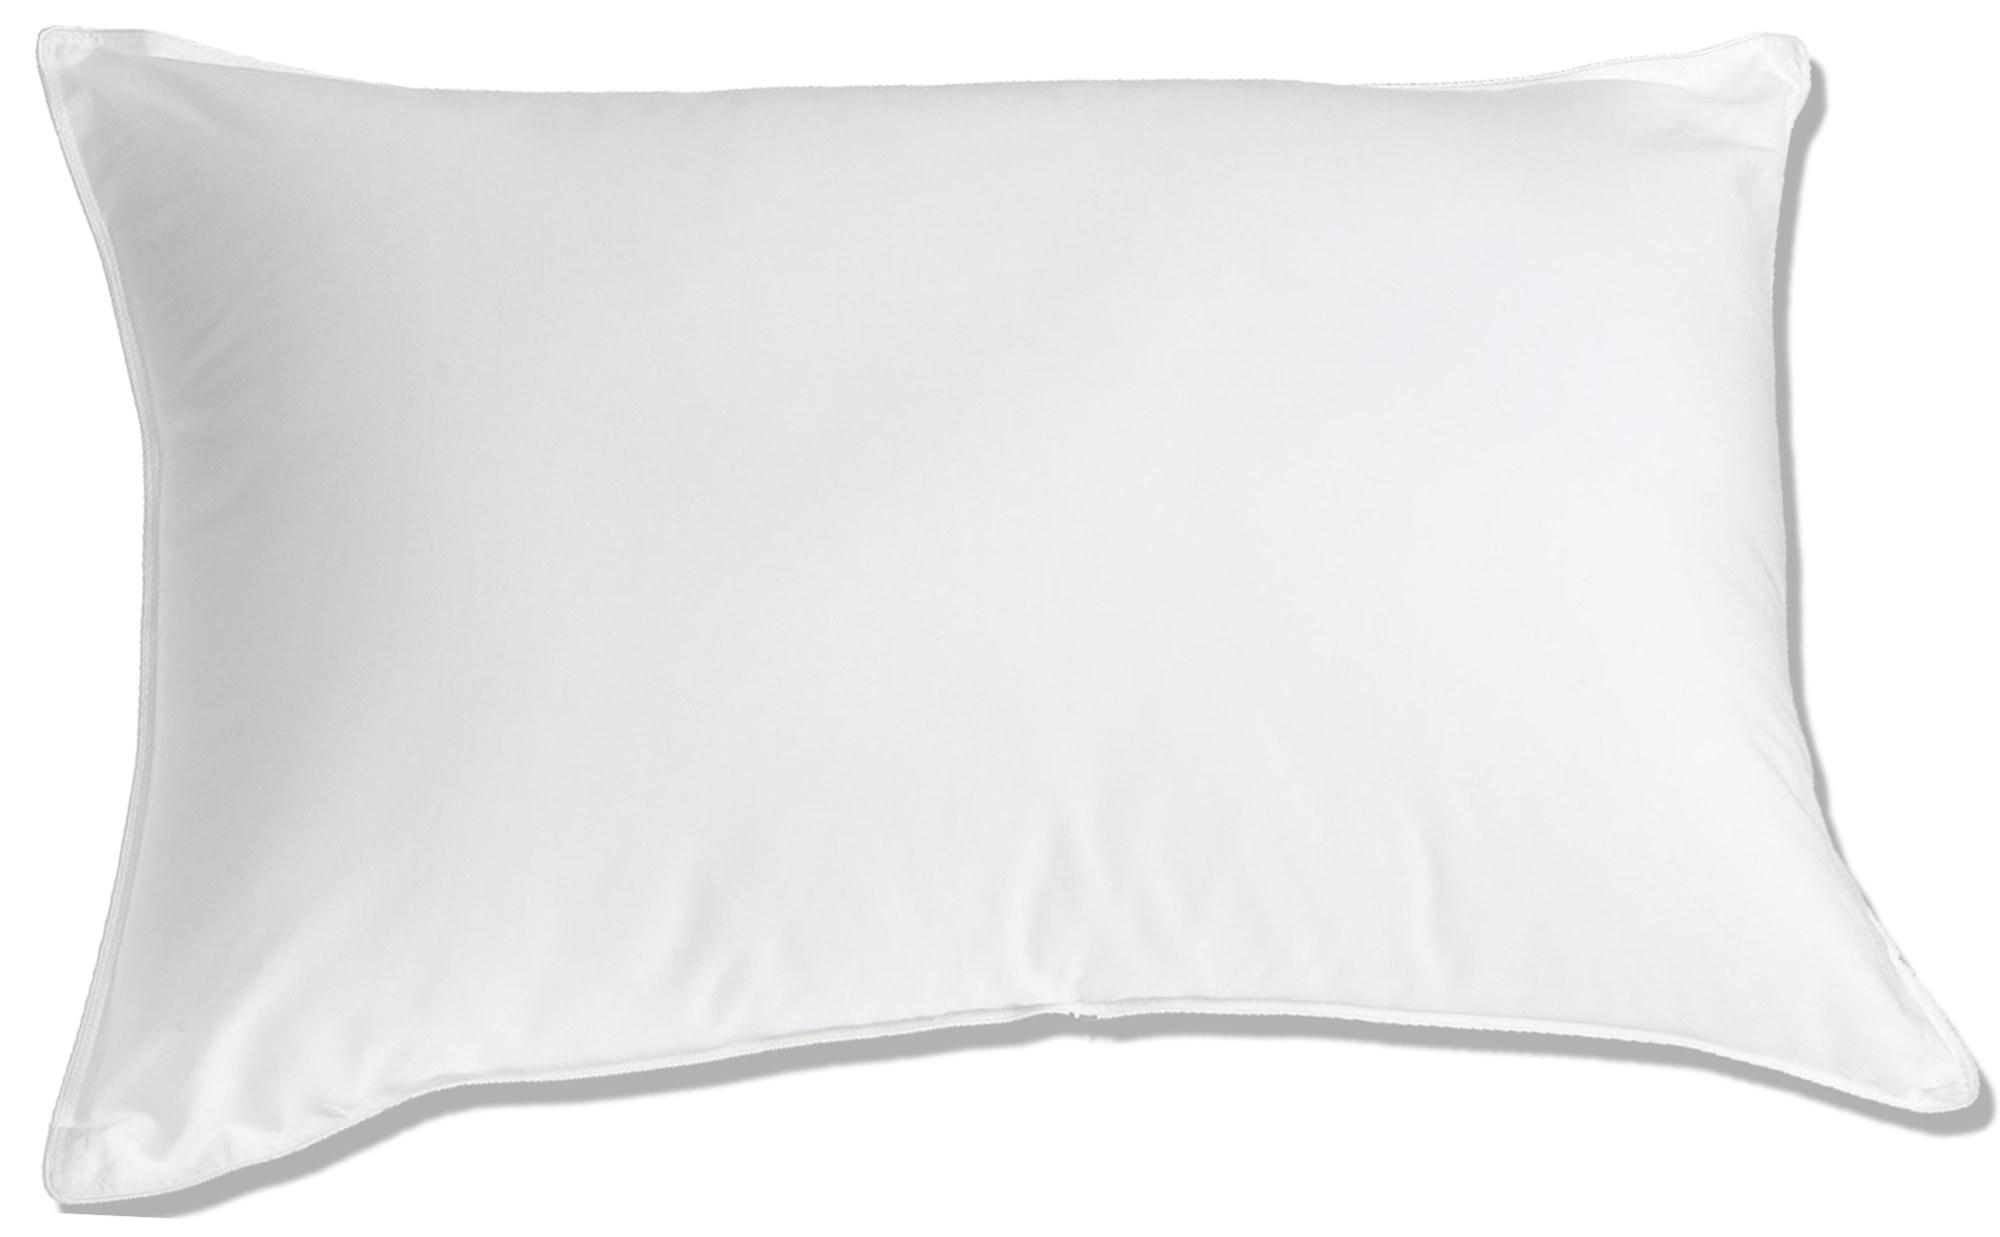 Luxuredown White Goose Down Pillow Medium Firm 300